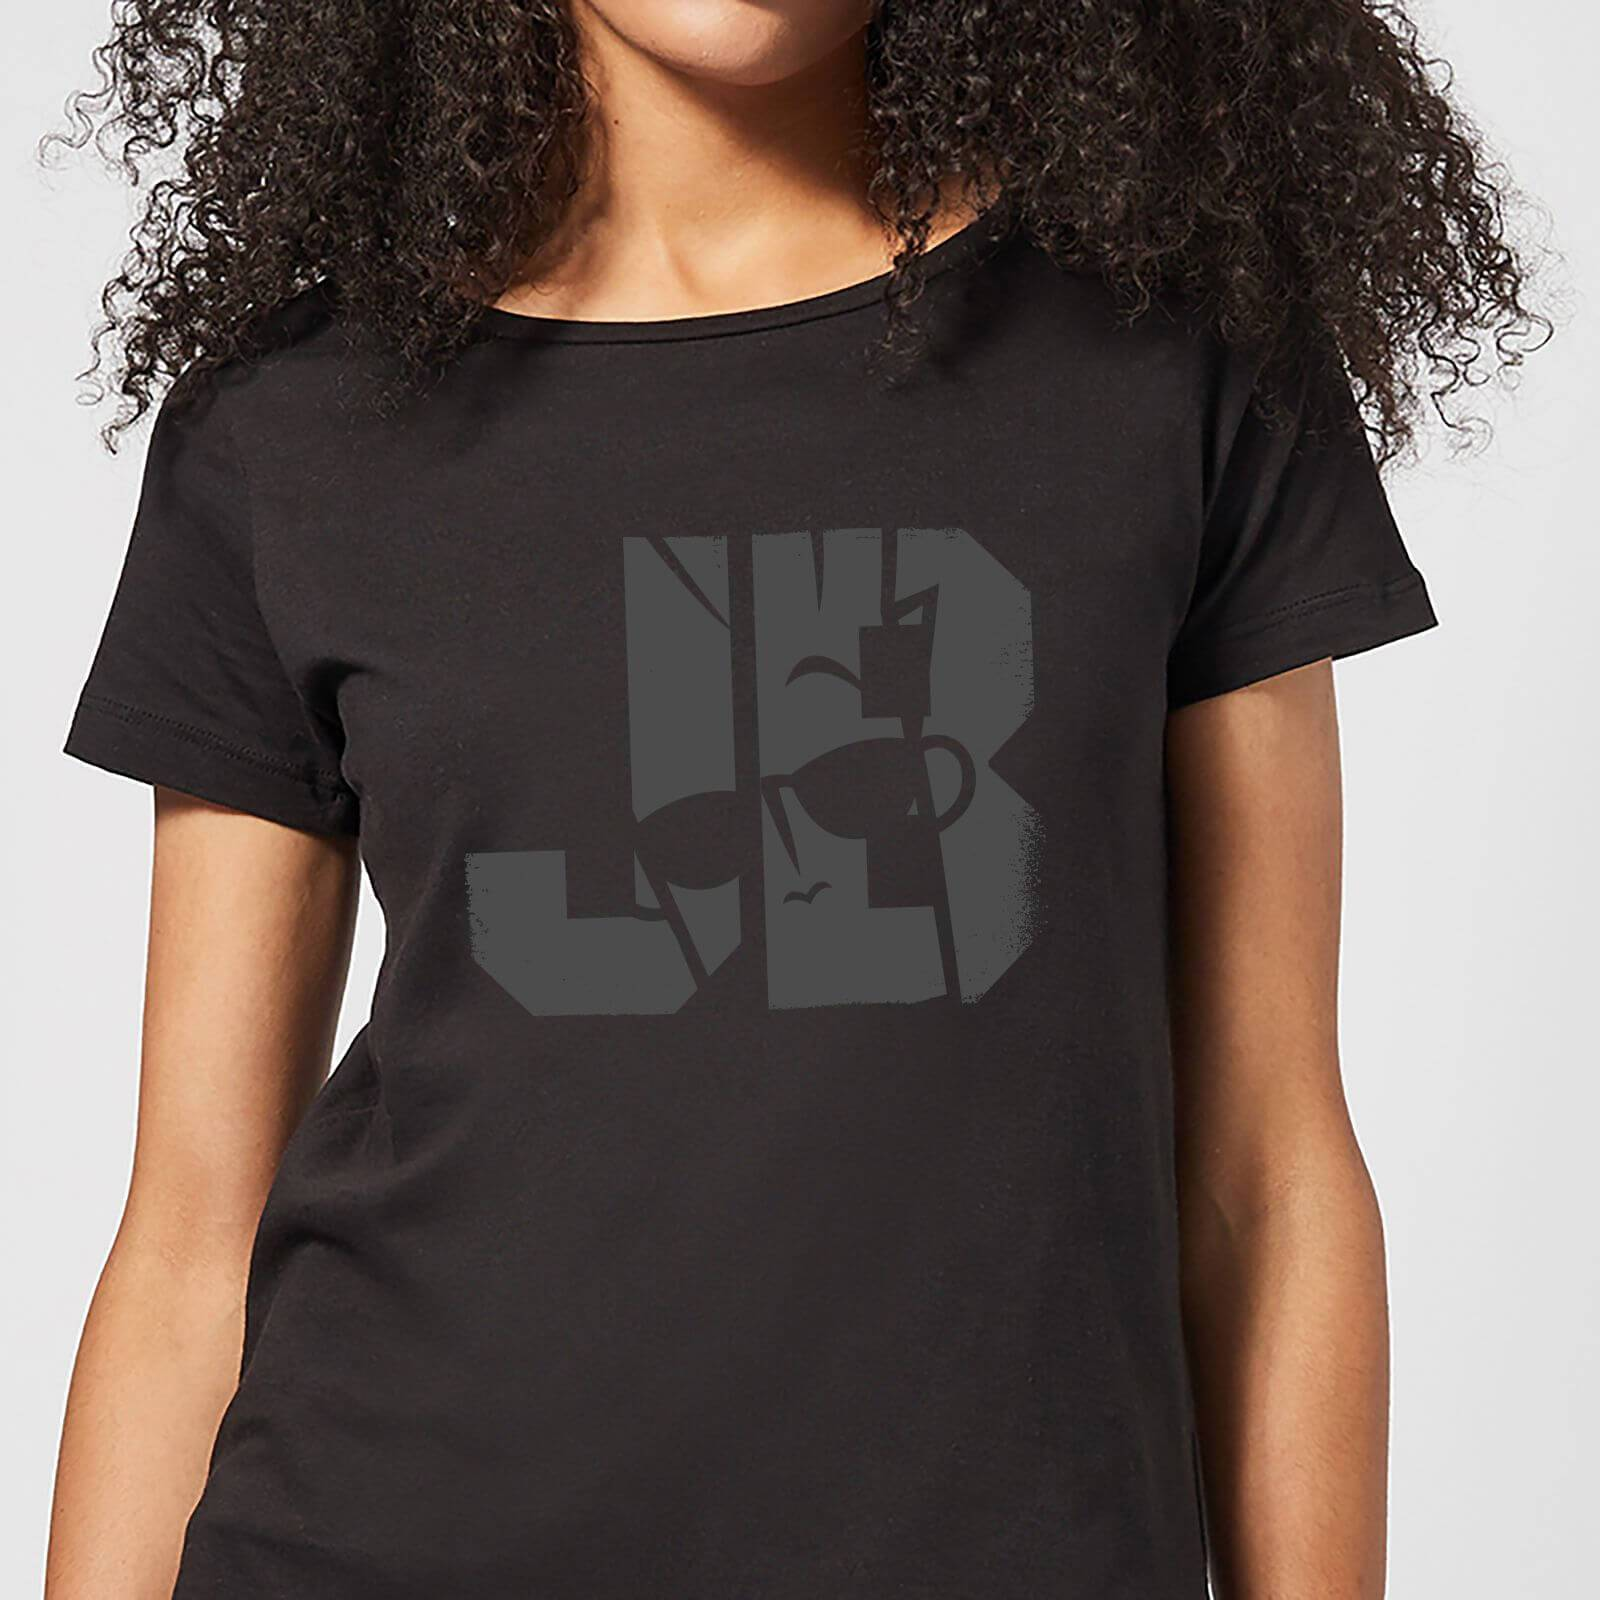 Cartoon Network Johnny Bravo JB Sillhouette Women's T-Shirt - Black - M - Black